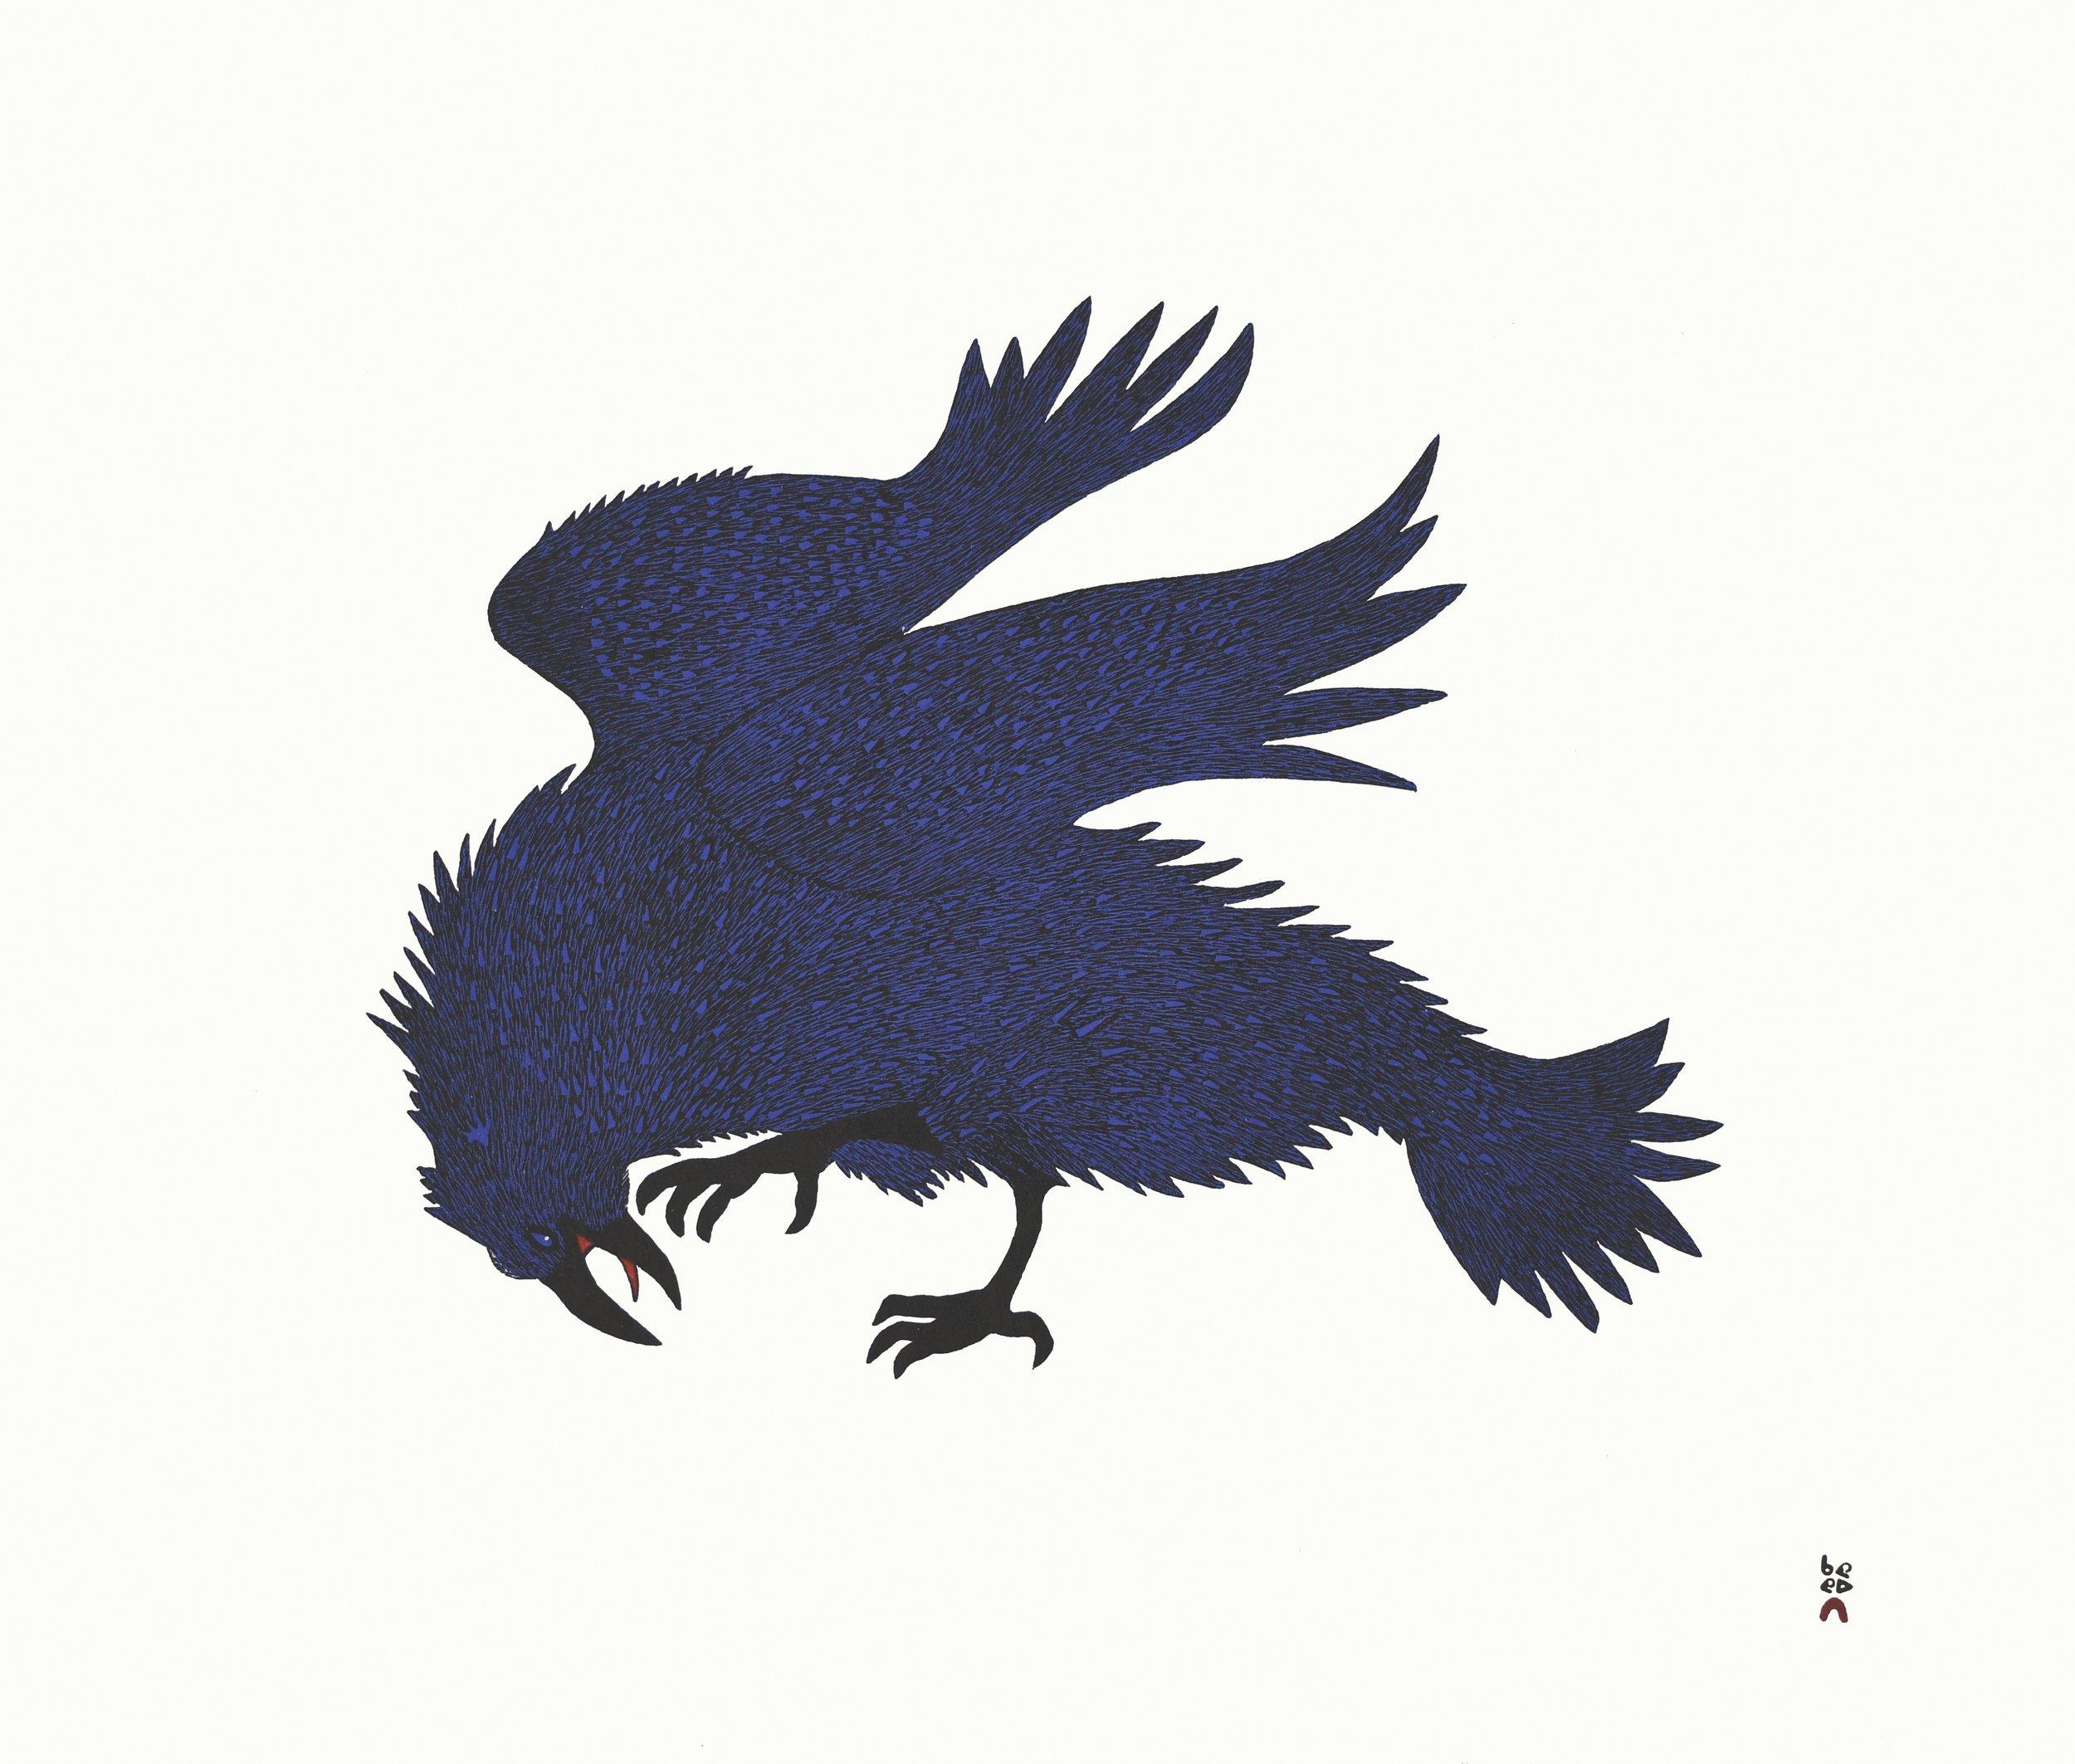 QUVIANAQTUK PUDLAT  31. Electric Raven  Stonecut & Stencil  Paper: Kizuki Kozo White  Printer: Qavavau Manumie  62 x 73 cm  $ 900